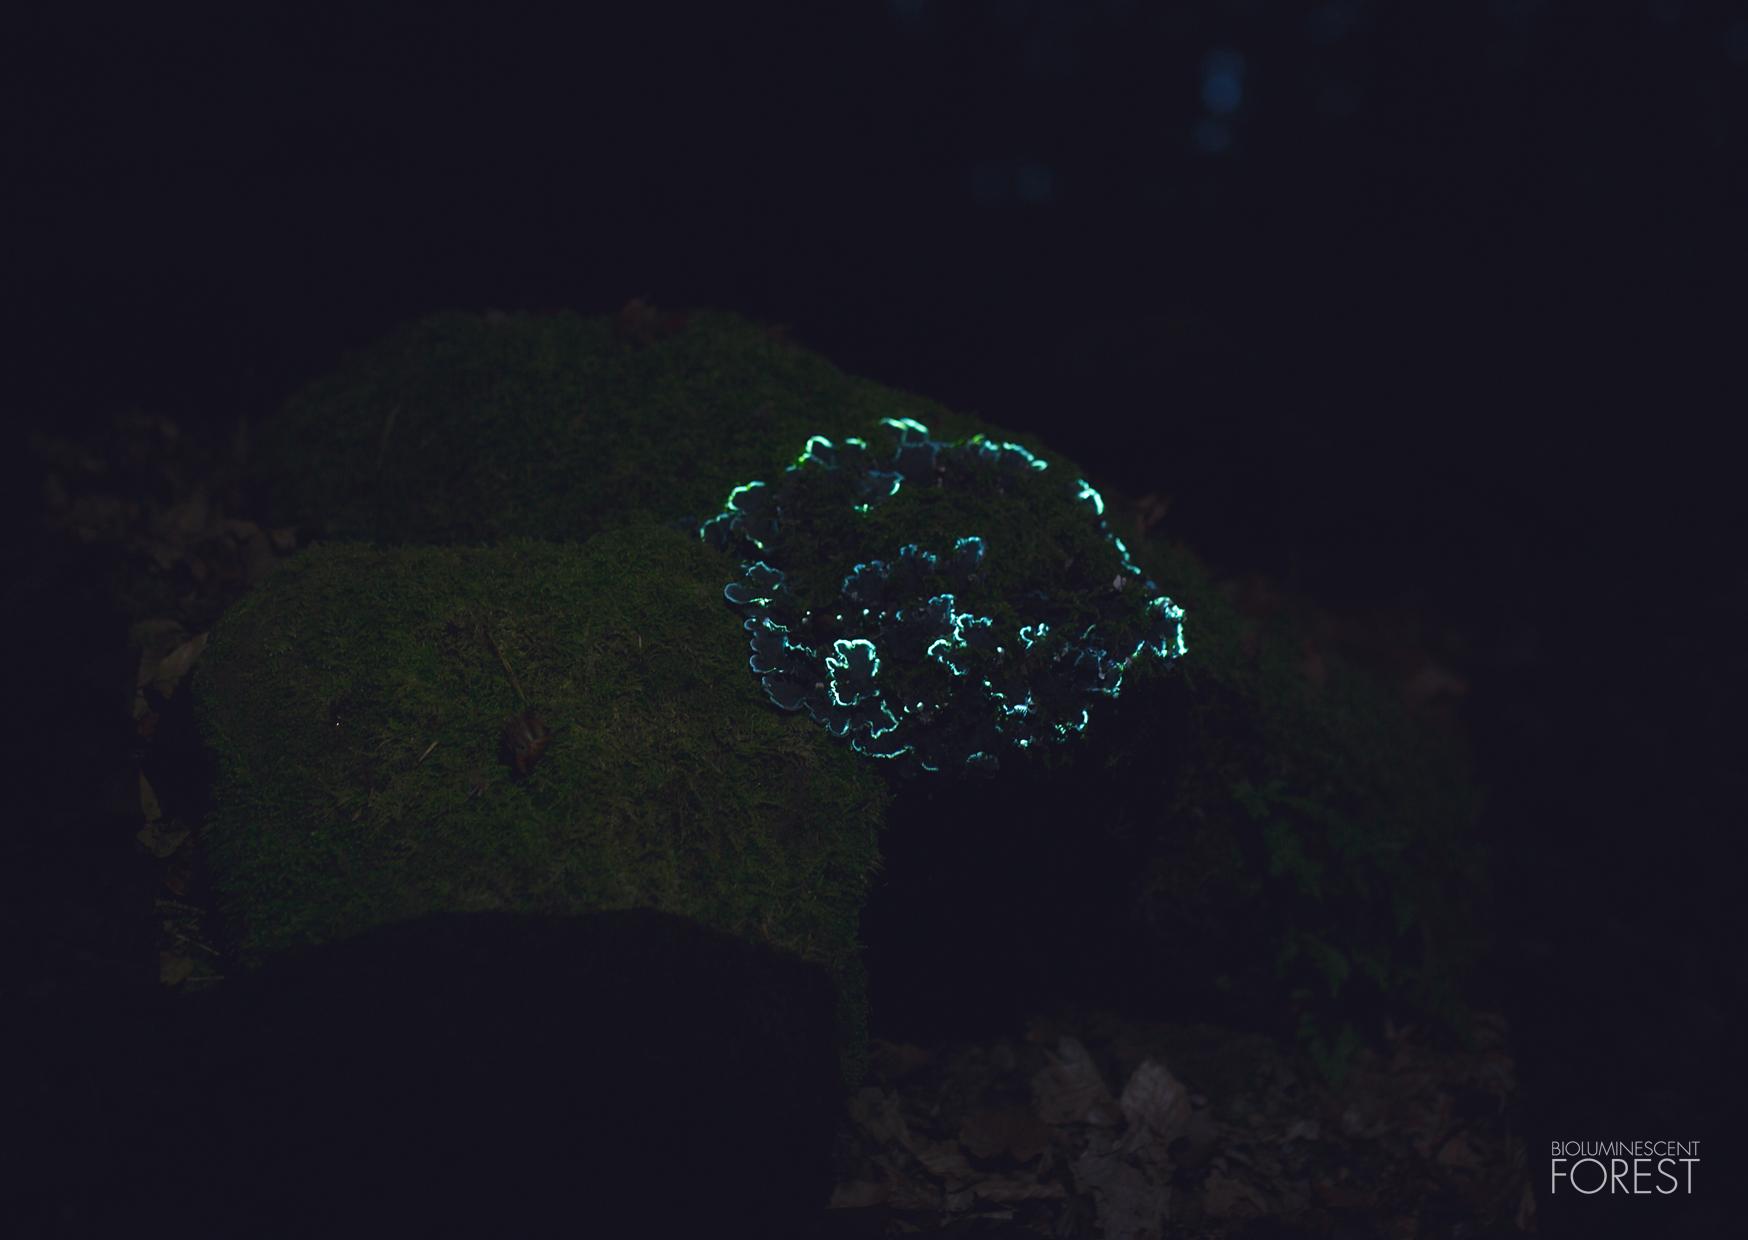 Bioluminescent forest – mushroom_round_03